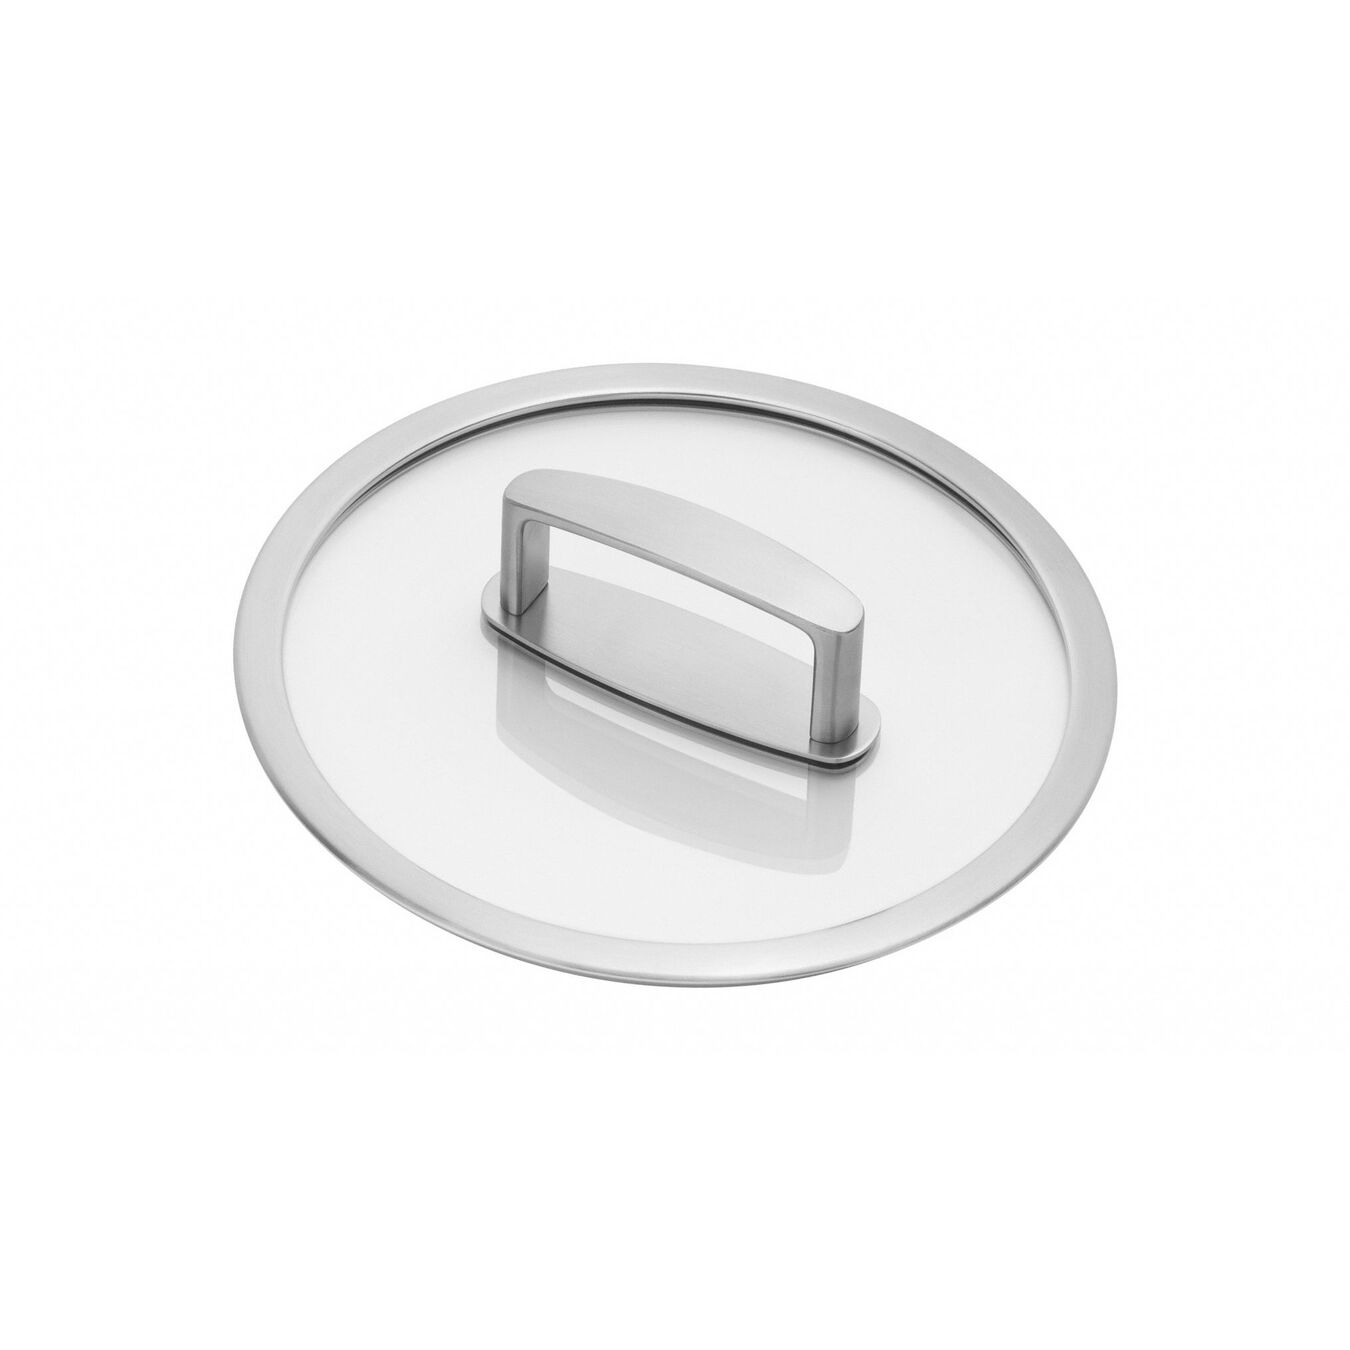 Tencere Seti | 18/10 Paslanmaz Çelik | 5-parça,,large 9